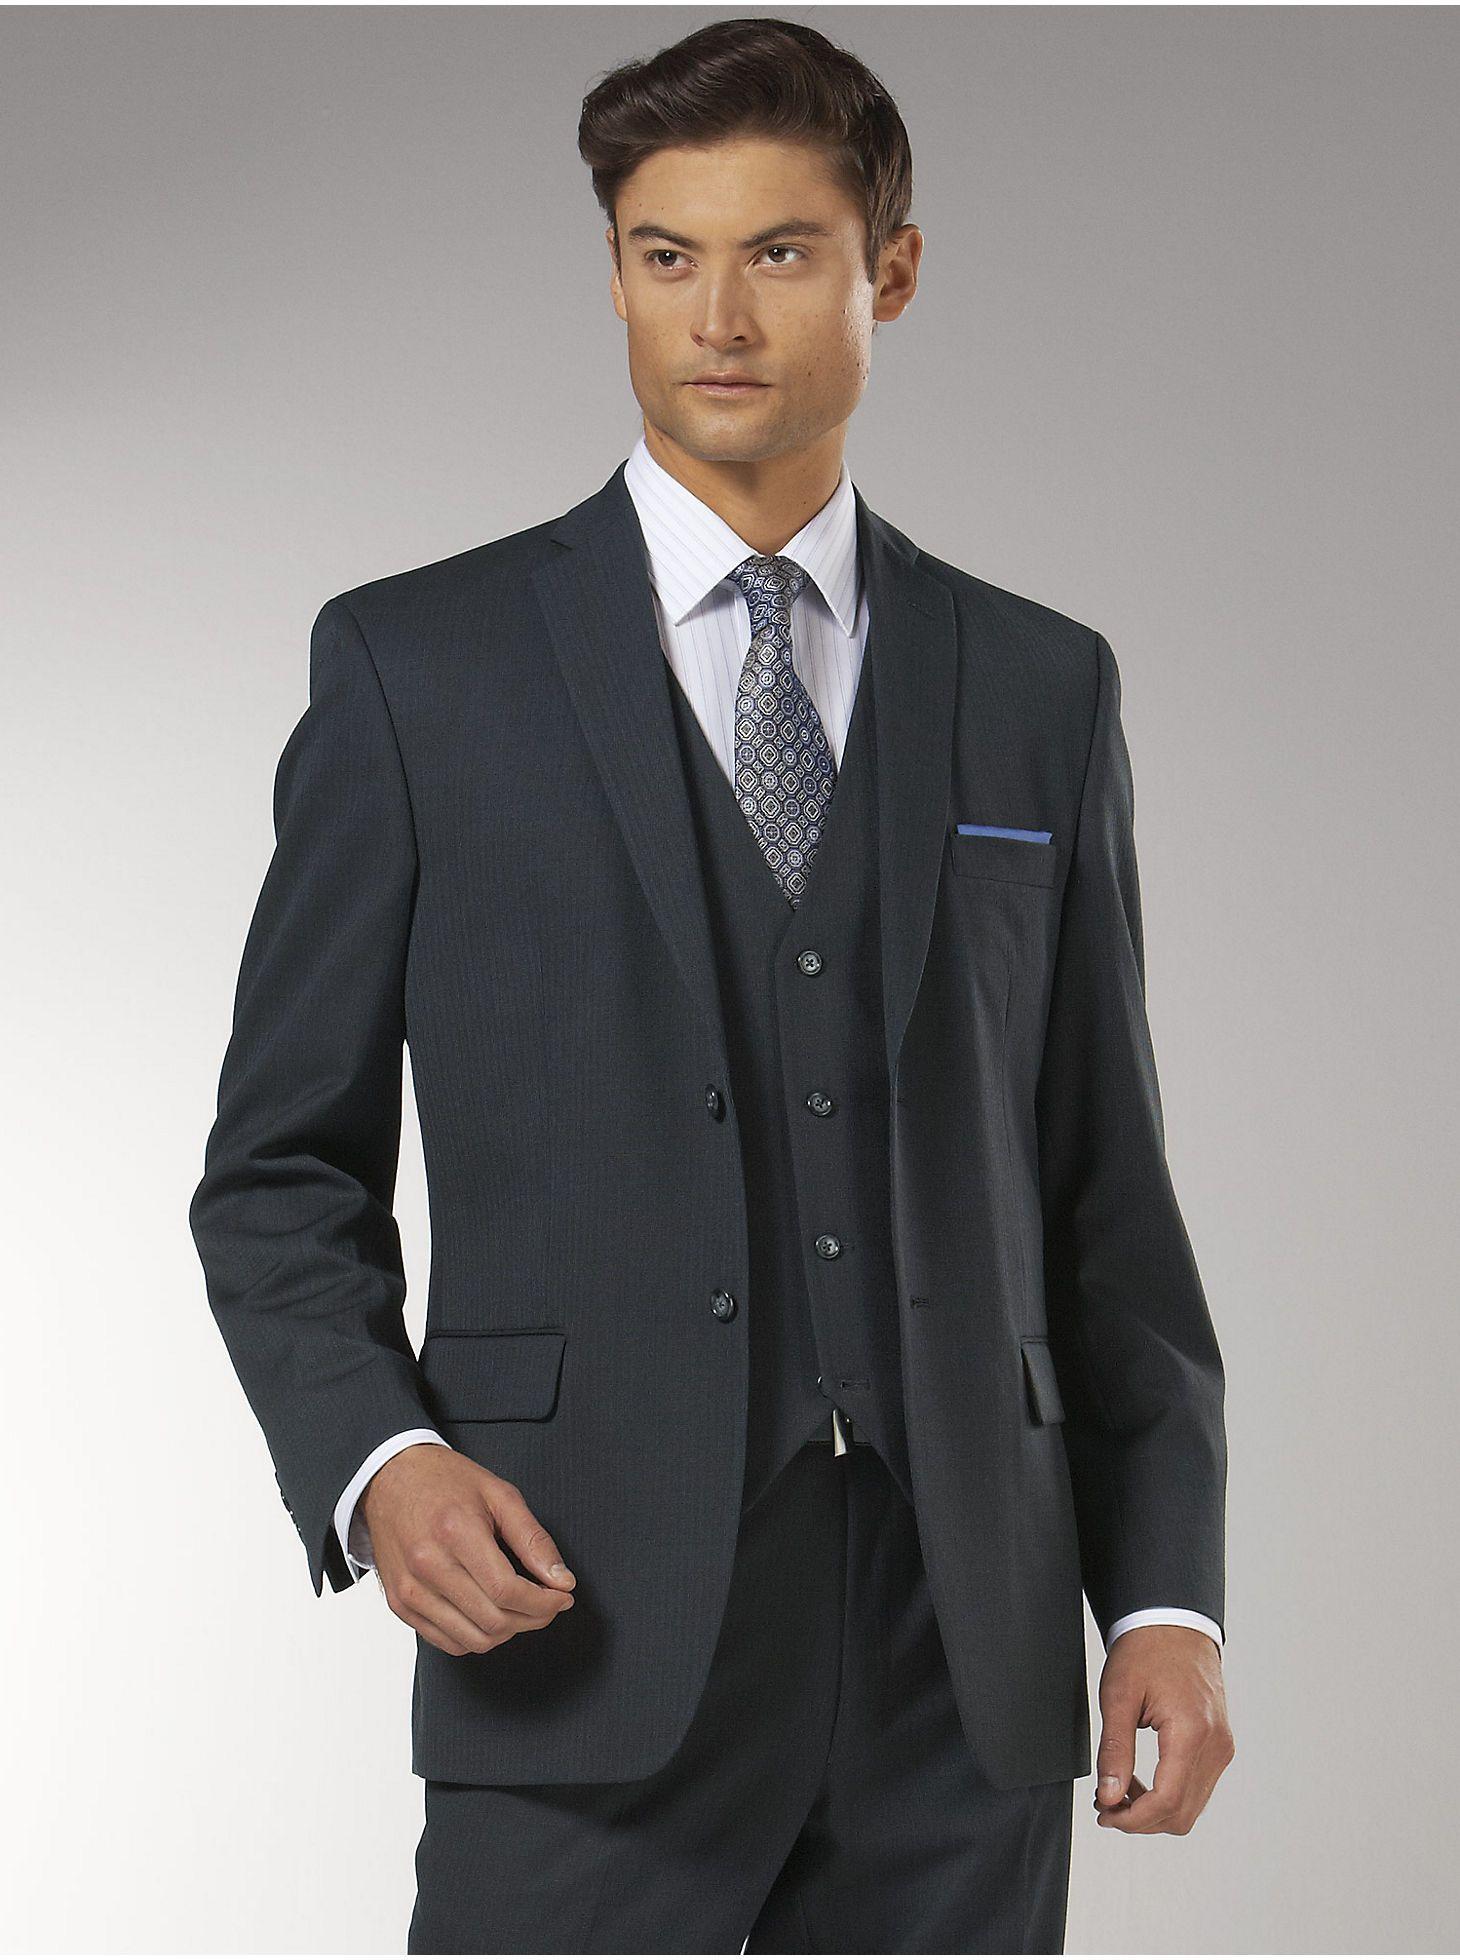 Suits Wilke Rodriguez Charcoal Bone Vested Slim FitSuit